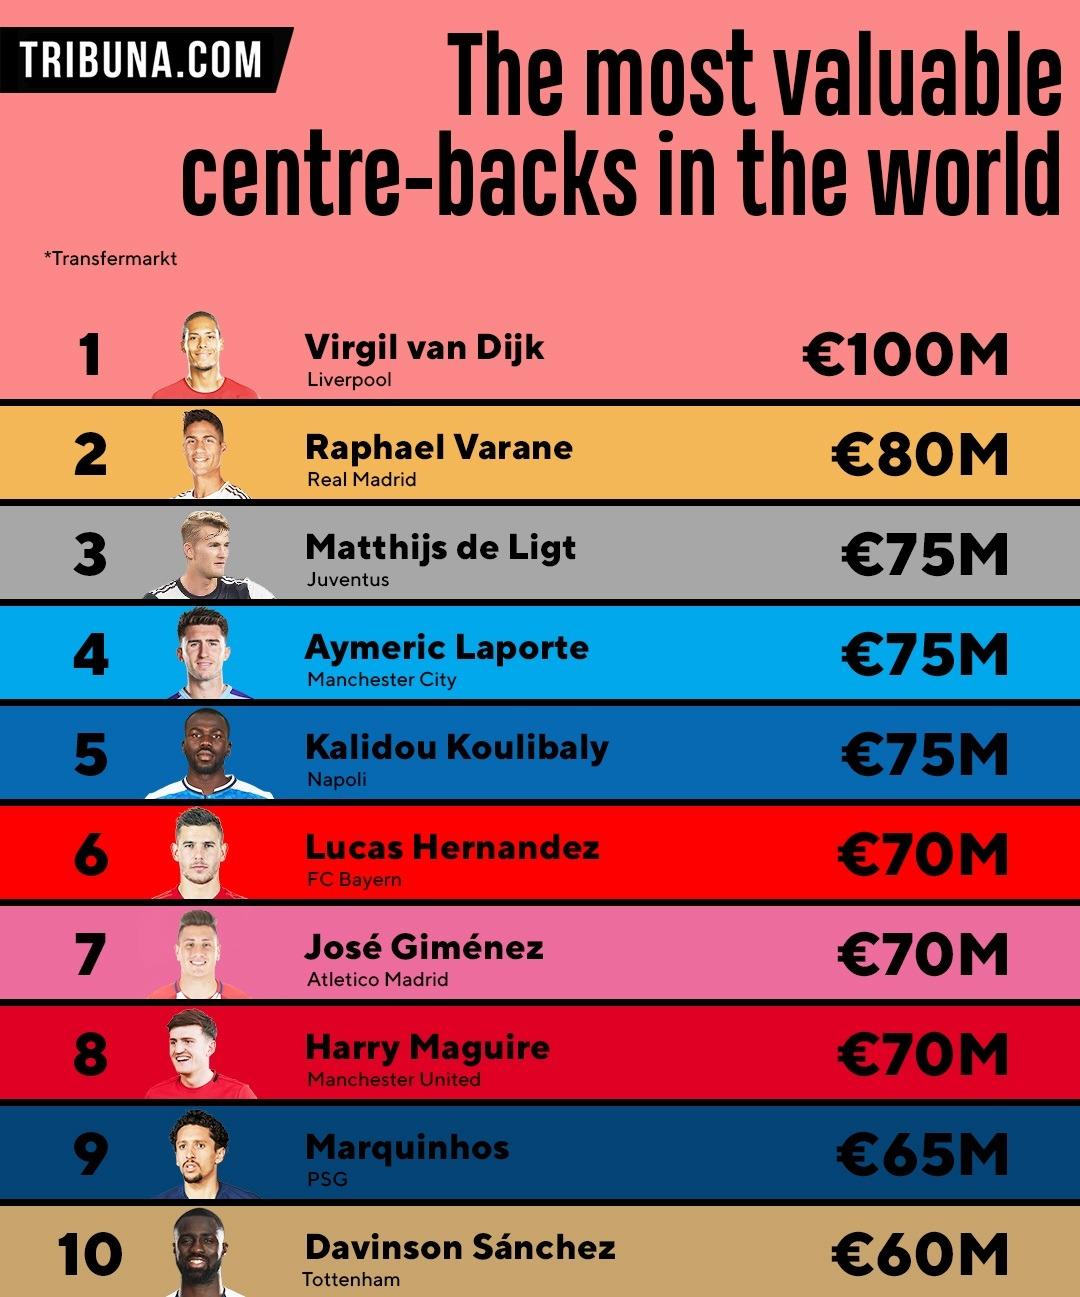 Virgil van Dijk, Liverpool, hậu vệ xuất sắc nhất thế giới, van dijk rửa bát